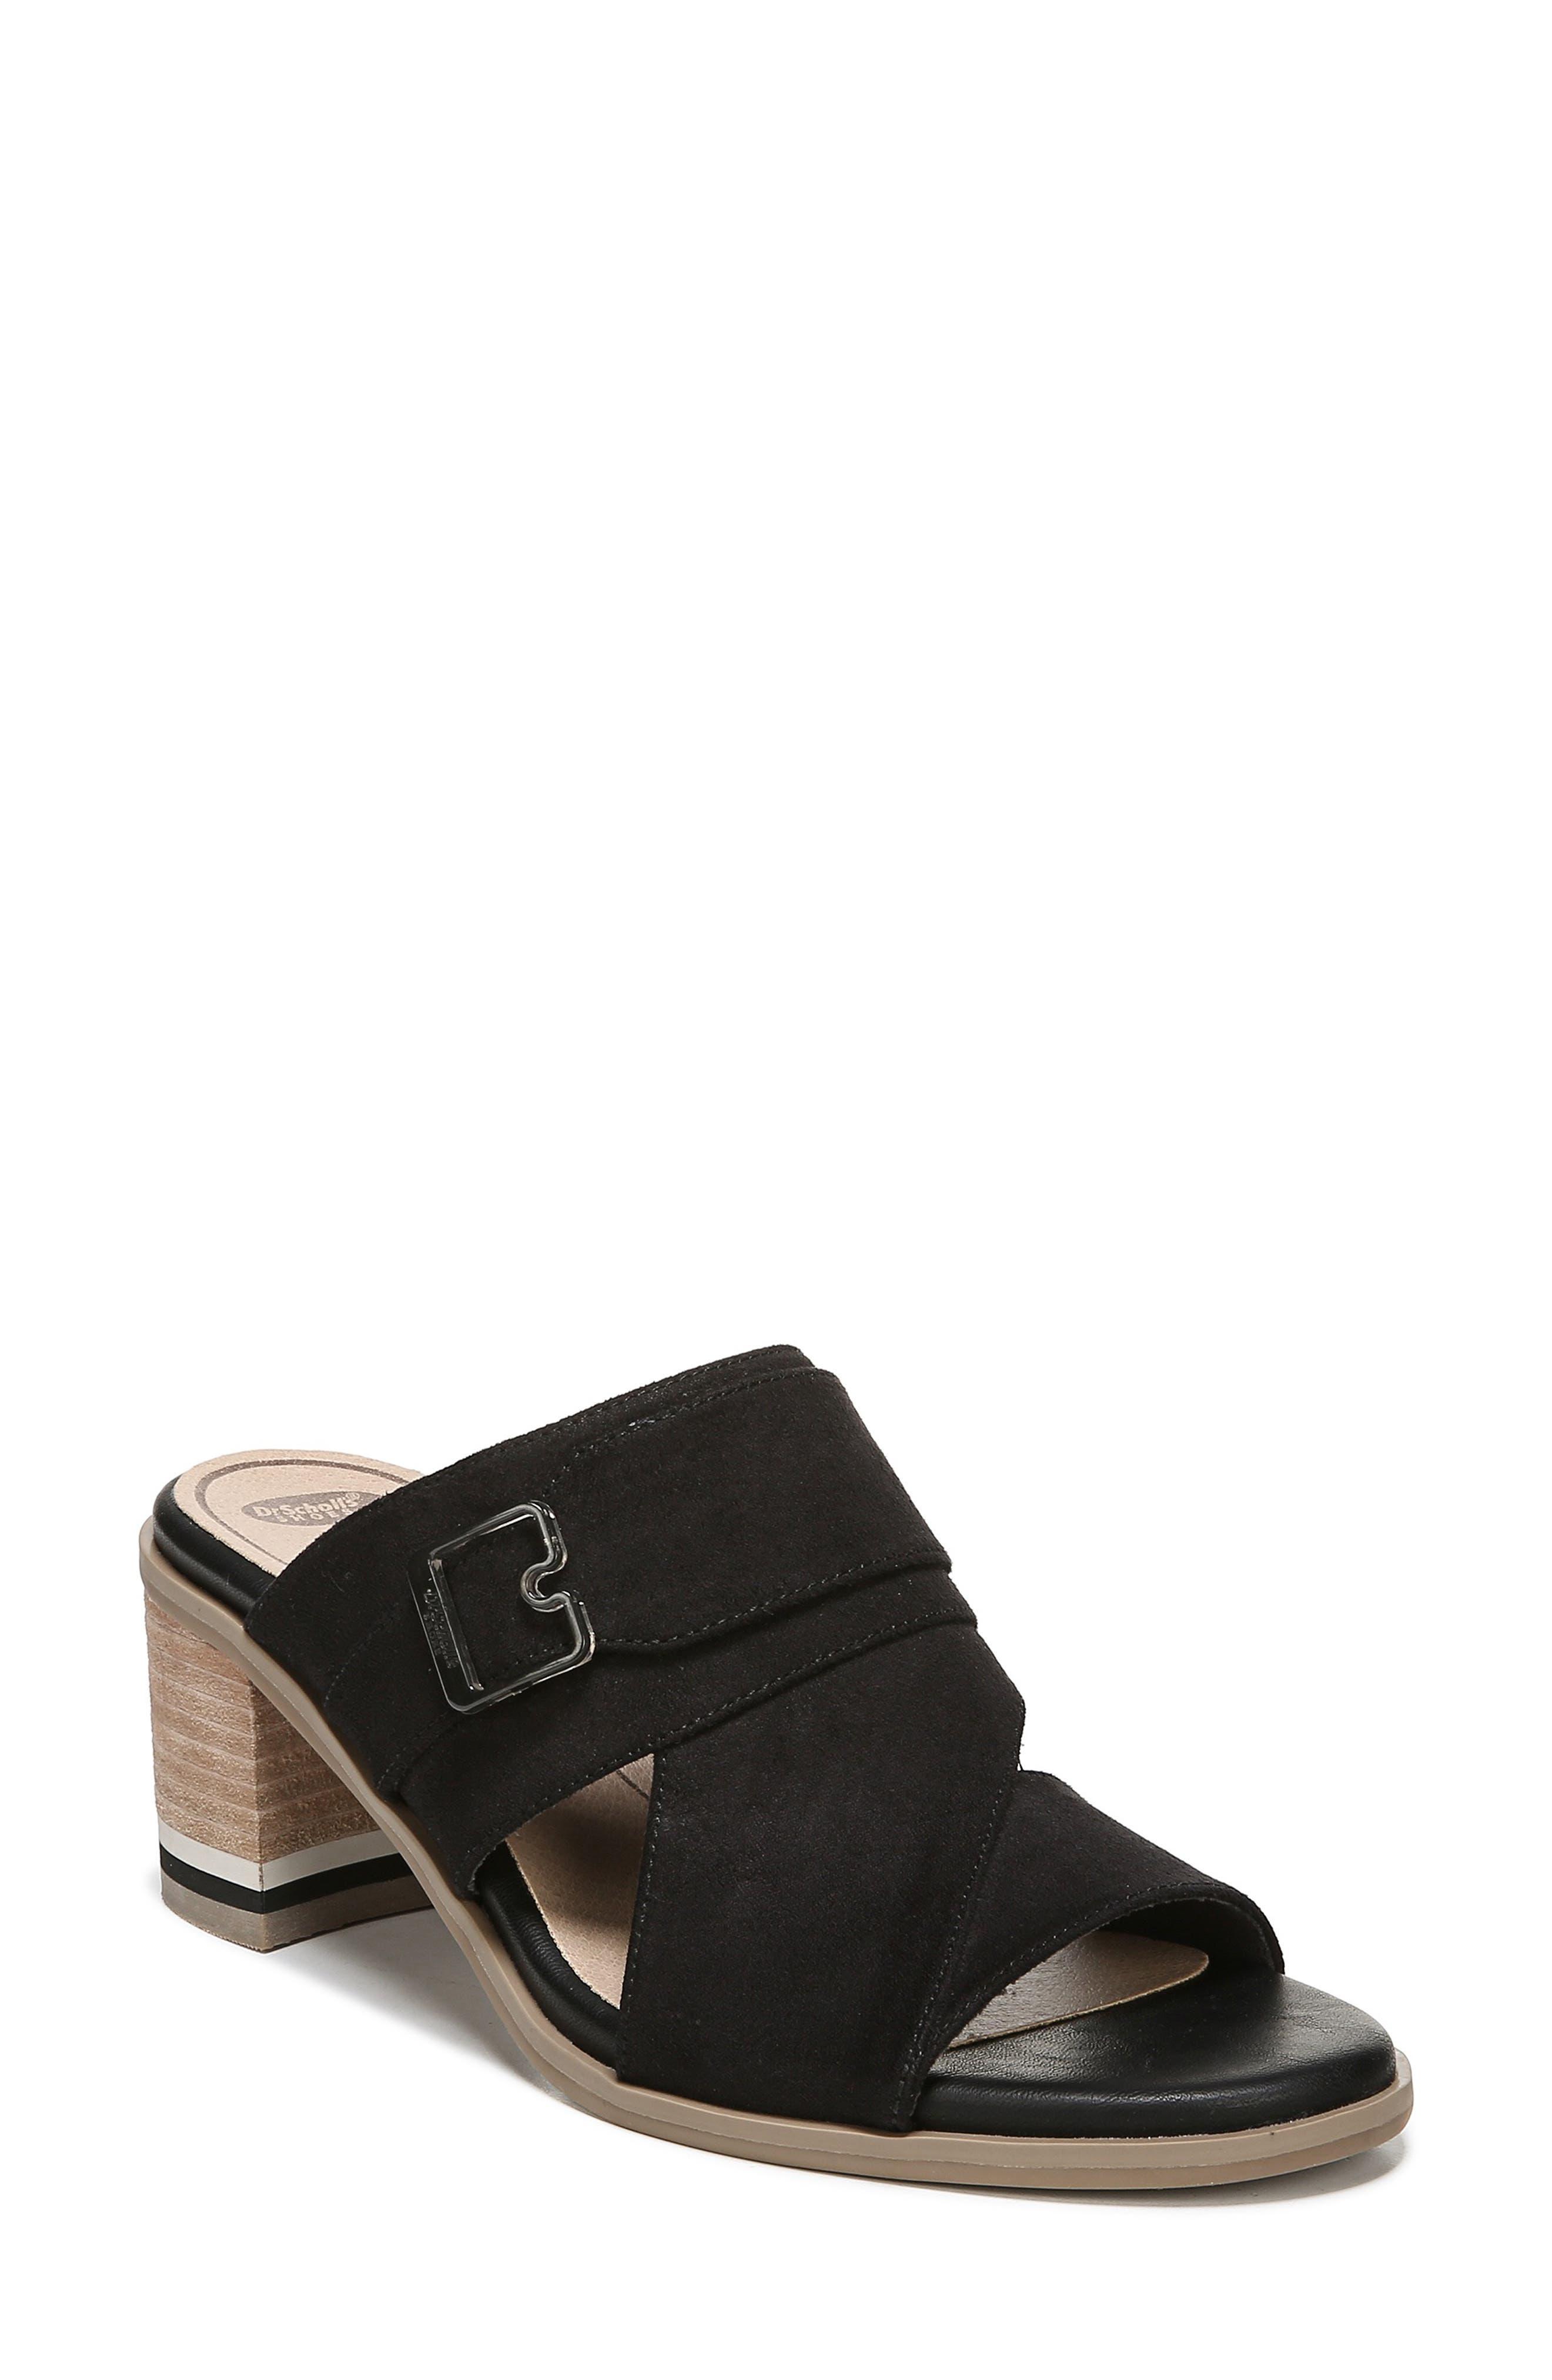 Spellbound Sandal, Main, color, 001